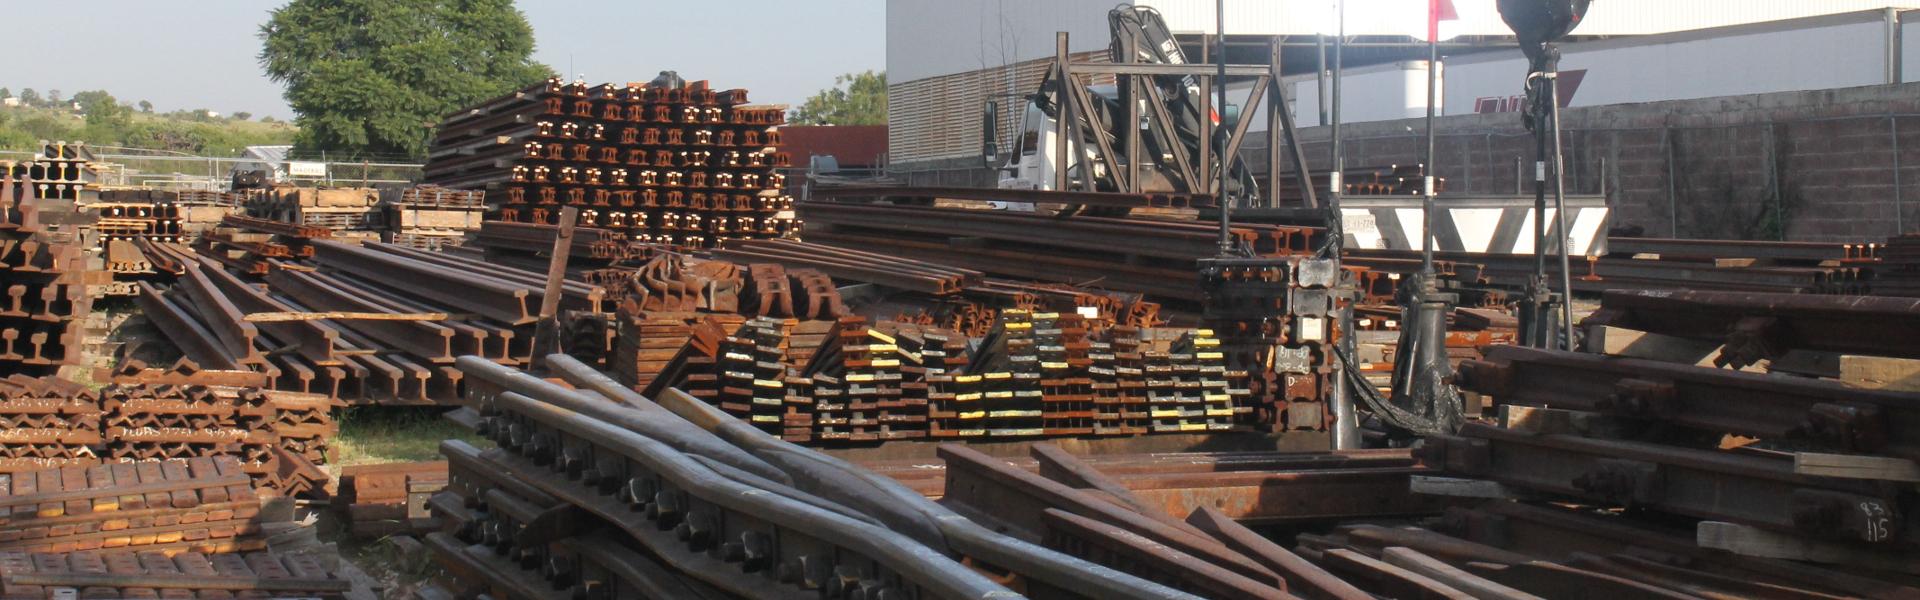 Rieles ferroviarios - Accesorios